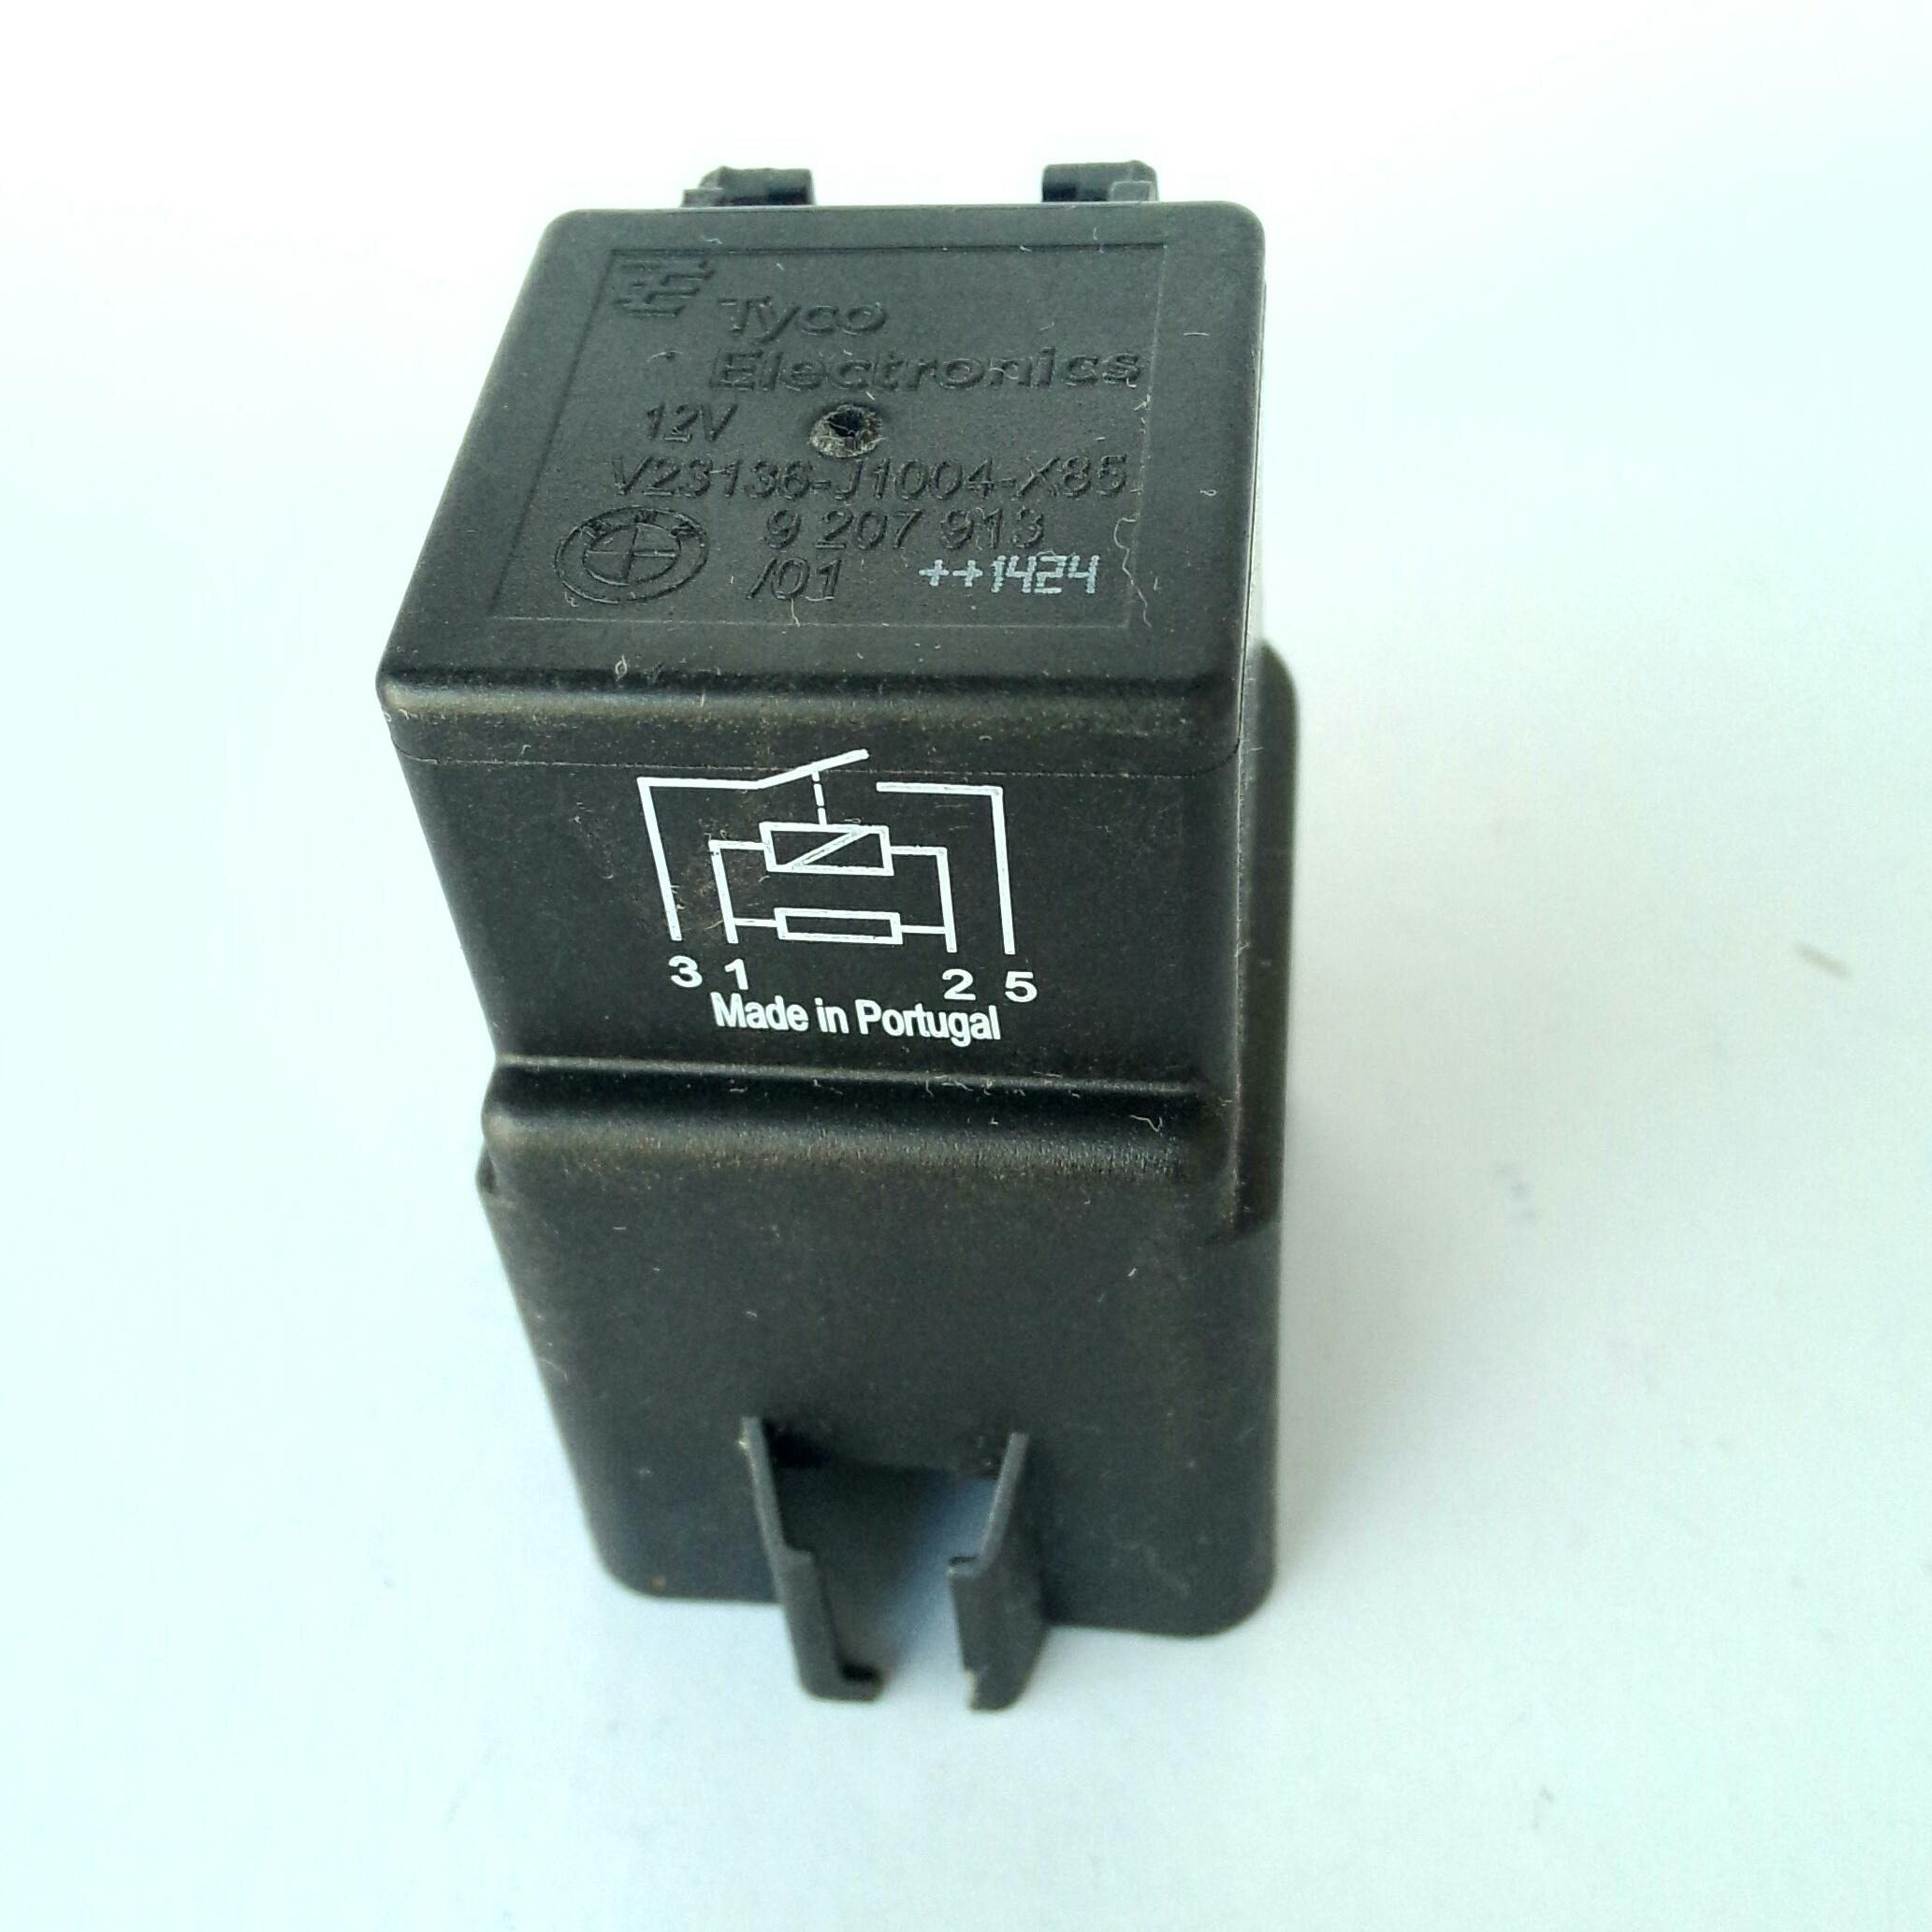 Реле 70А 12в BMW 61 36 9 207 913 Tyco Electronics V23136-J1004-X85